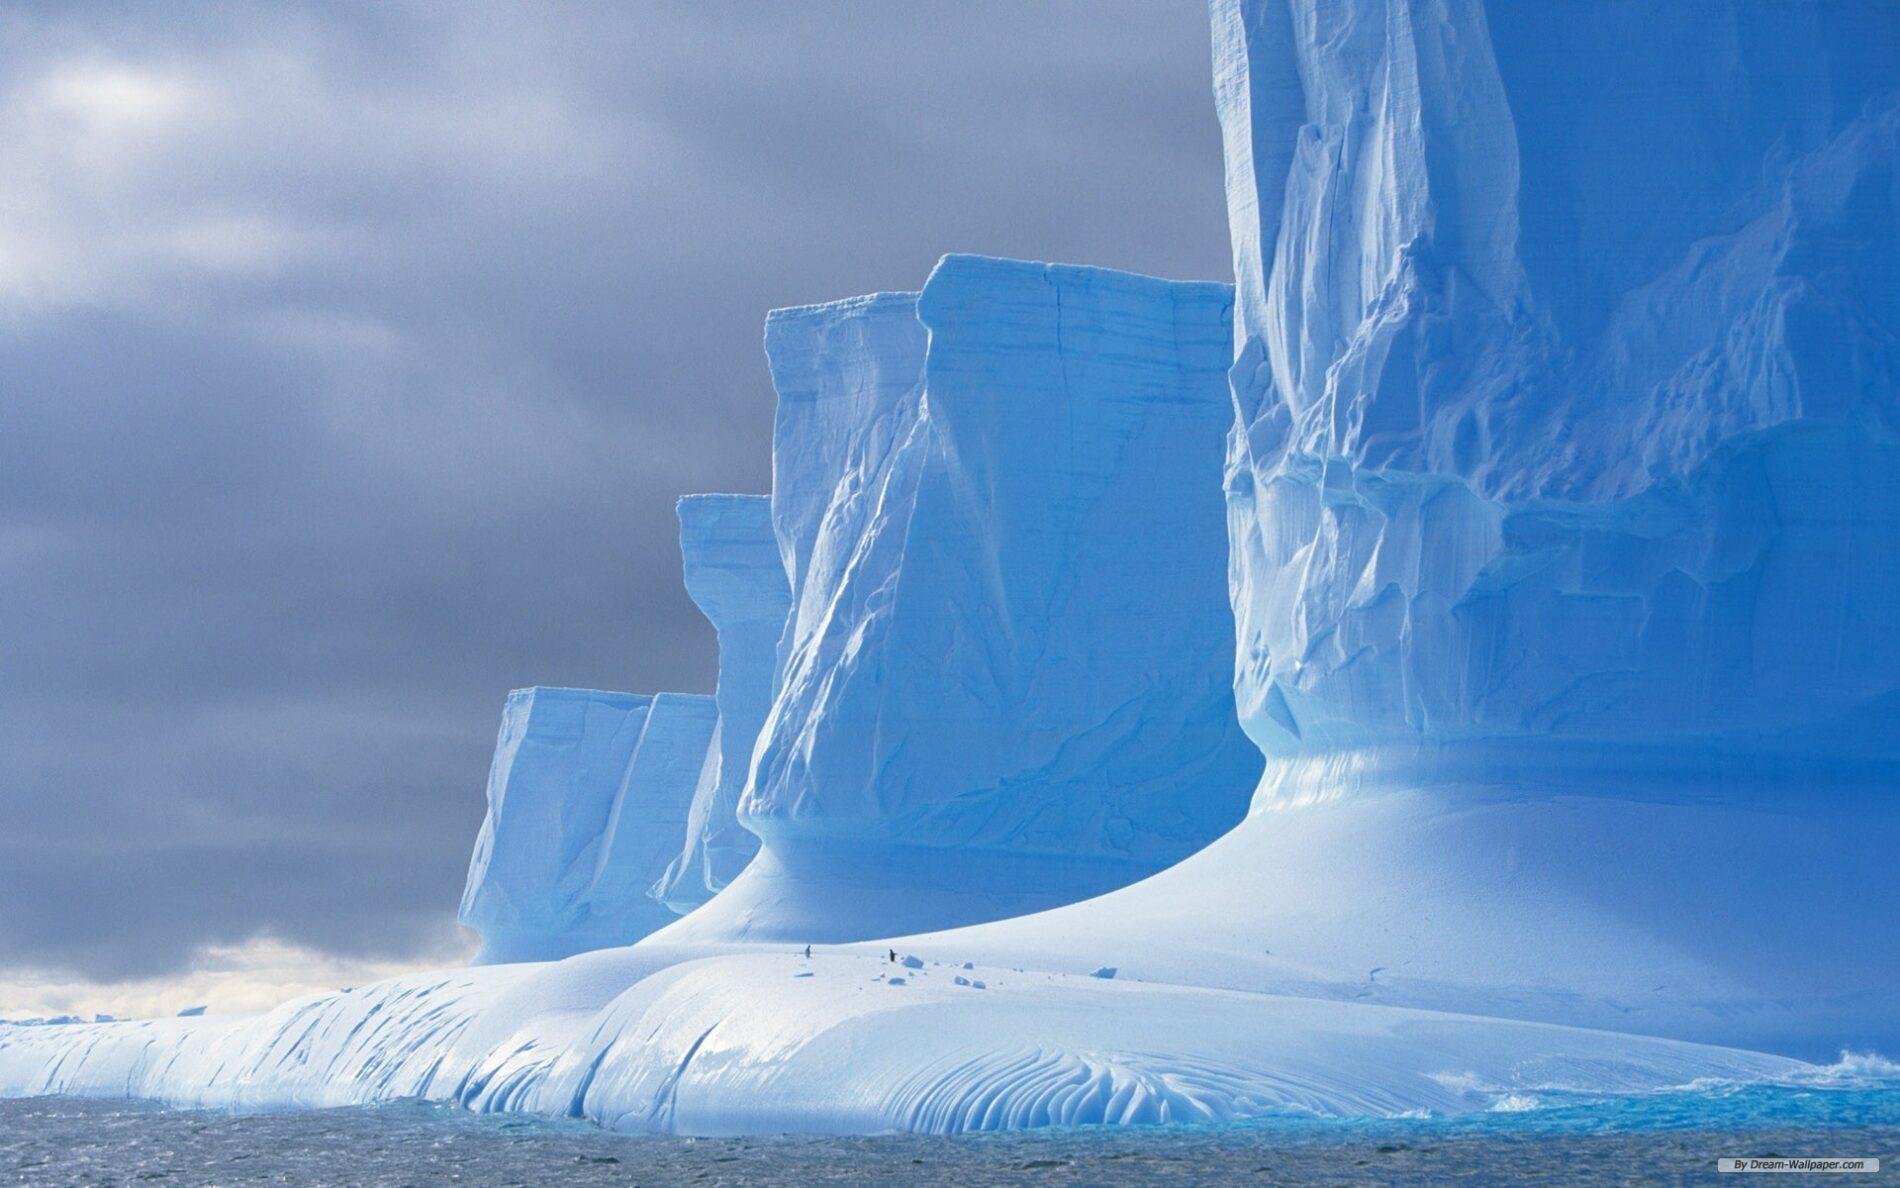 природа айсберг море горизонт nature iceberg sea horizon  № 3510988 загрузить